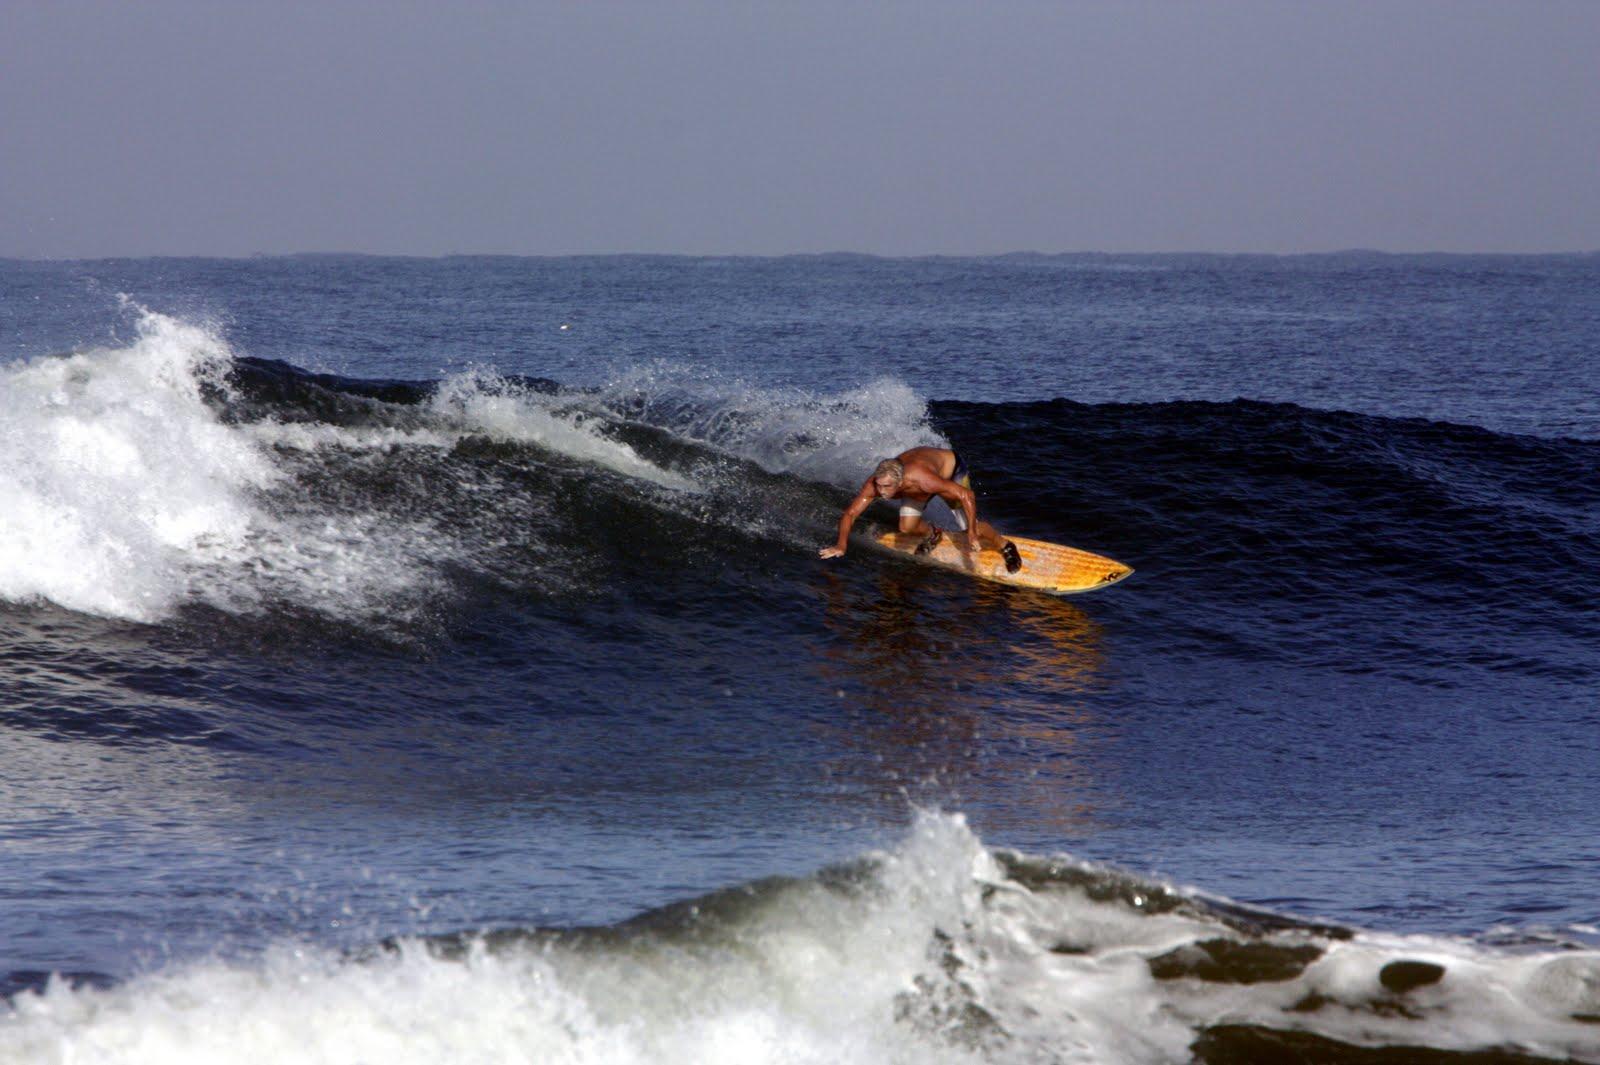 Gambar Gambar Berselancar Surfing Di Lautan Wallpaper